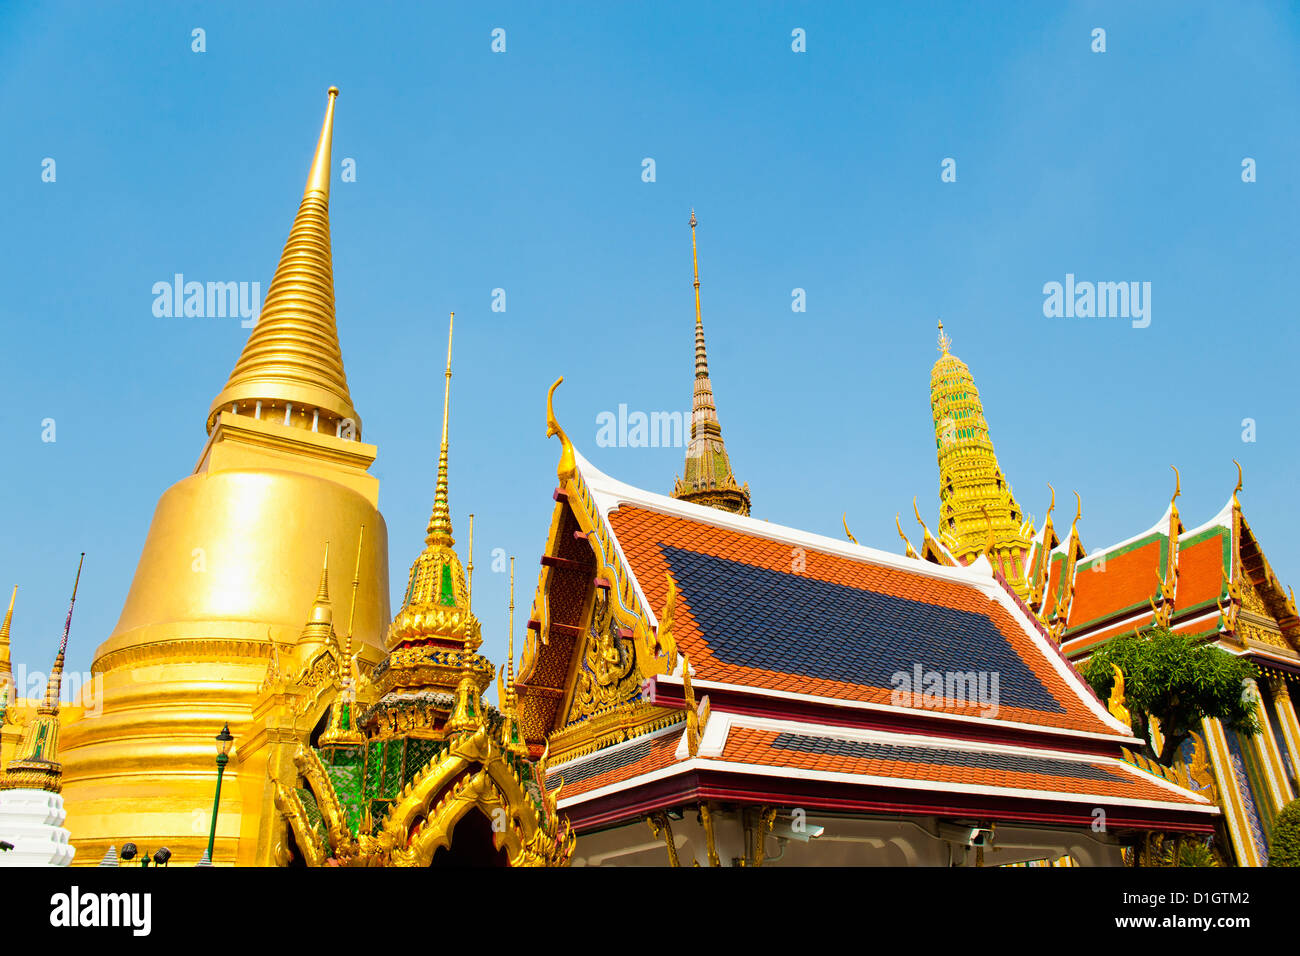 Gold spires at The Grand Palace, Bangkok, Thailand, Southeast Asia, Asia - Stock Image